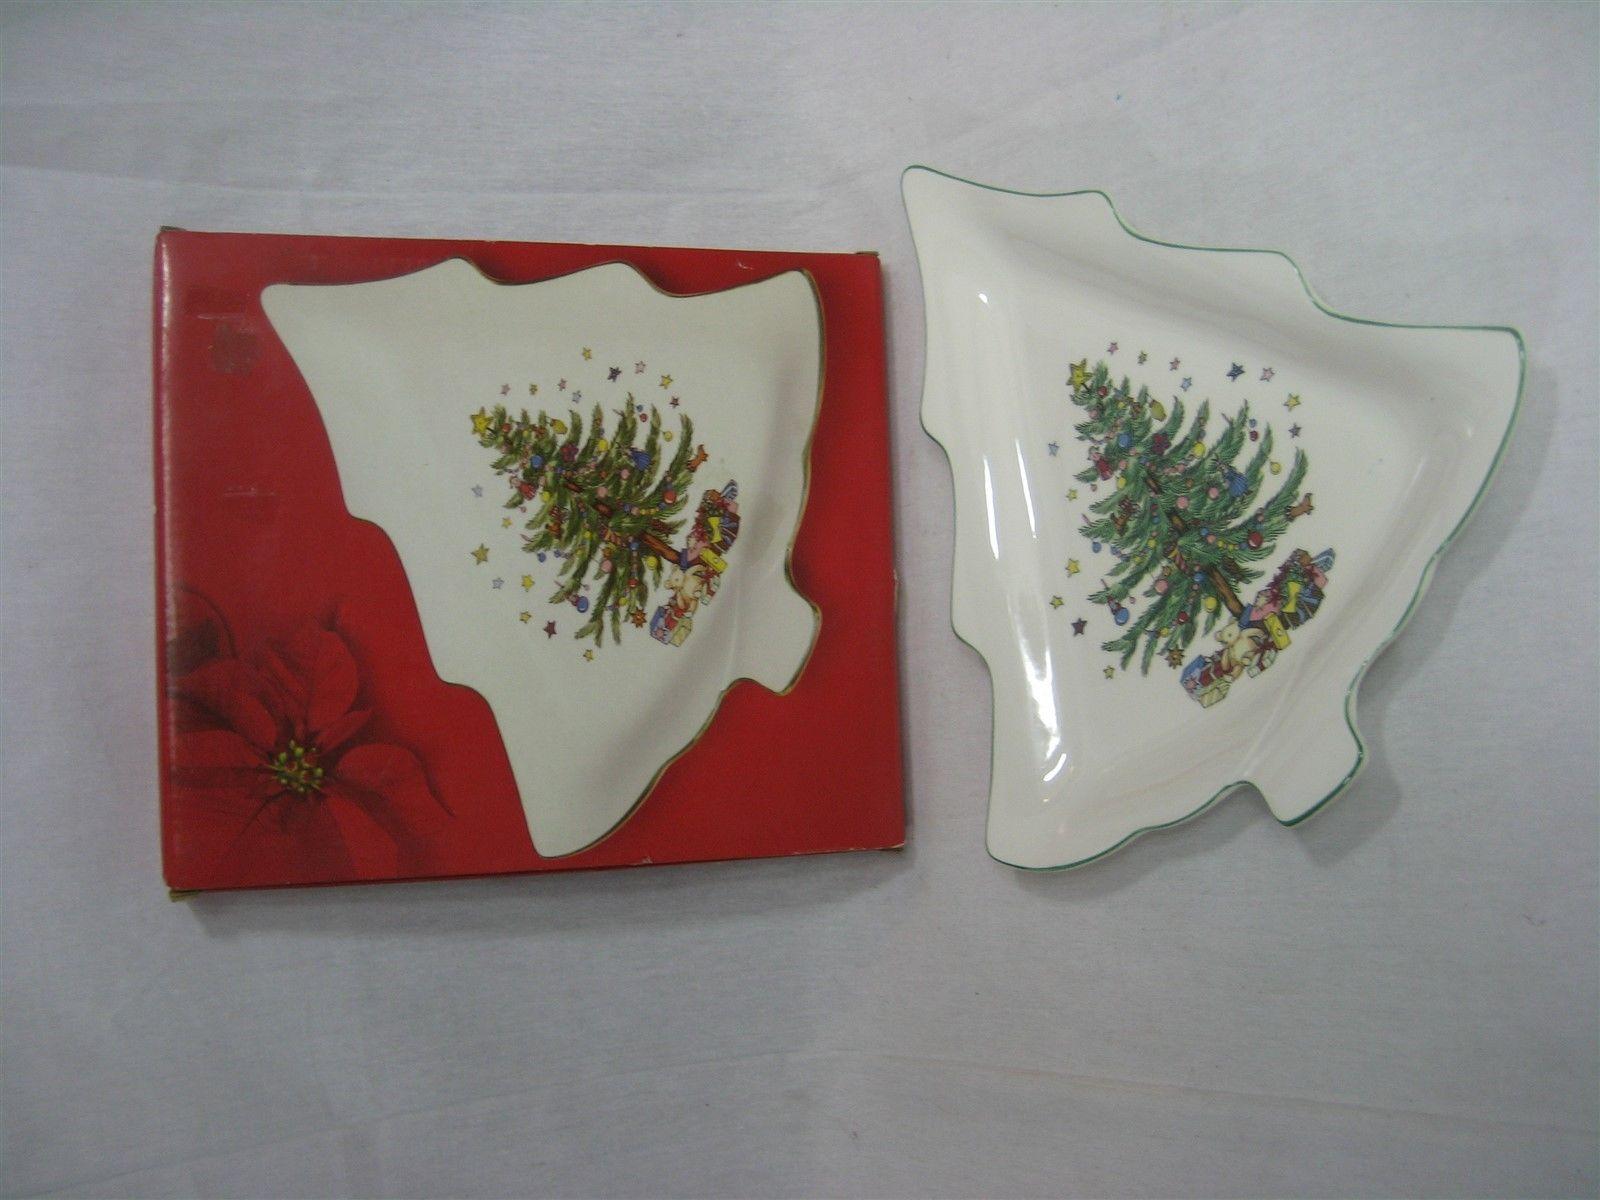 Nikko Christmastime Christmas Tree Shaped and 22 similar items